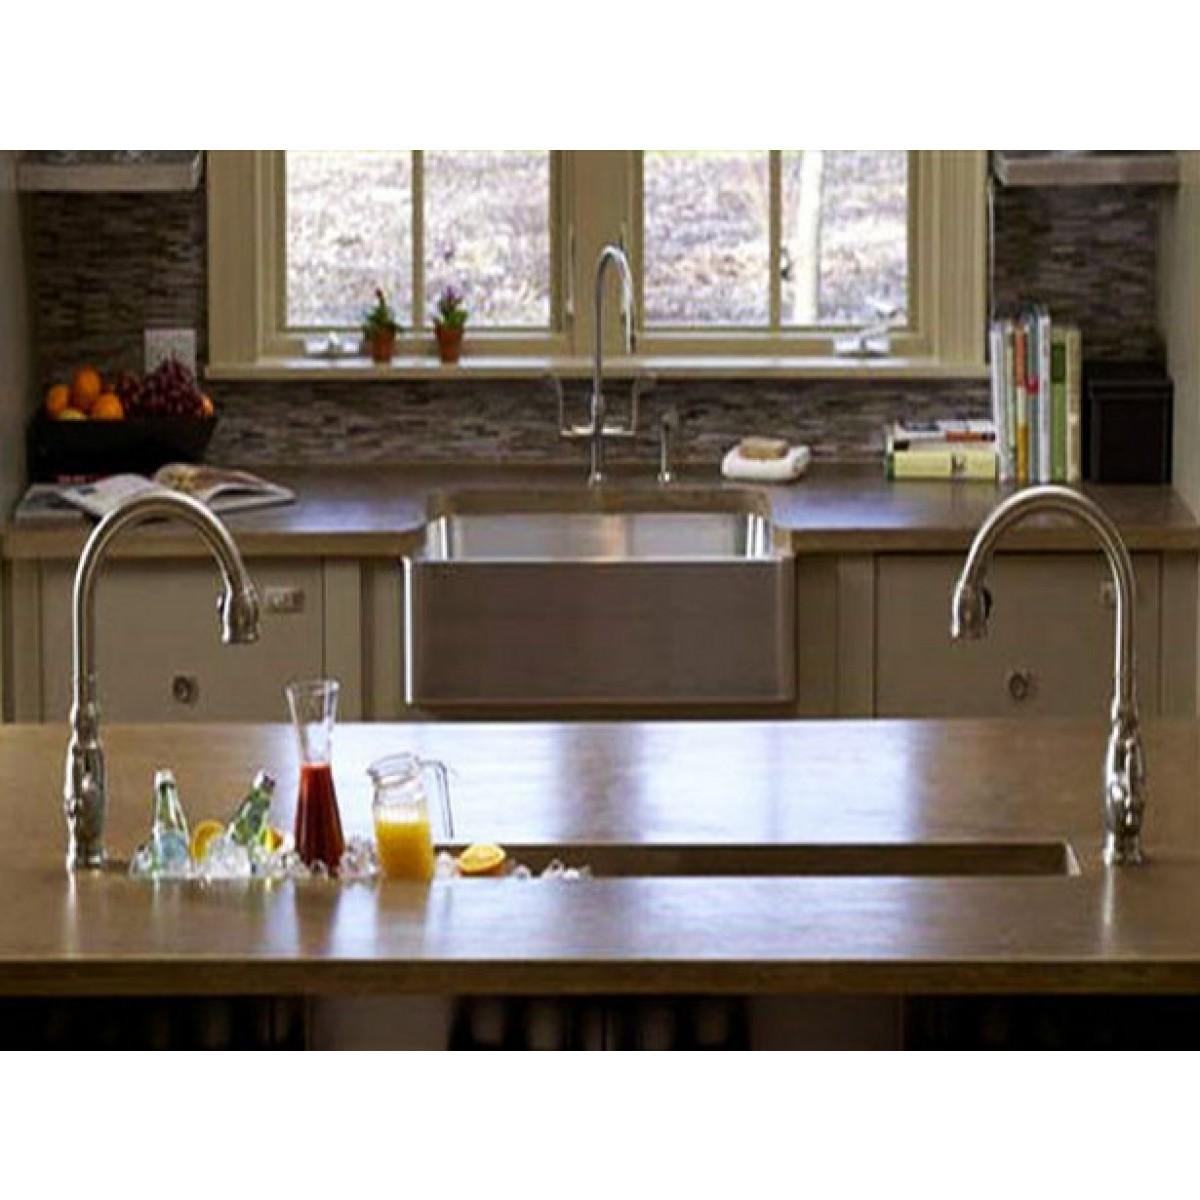 kitchen prep sink faucet kohler 32 inch stainless steel undermount single bowl bar regular price 530 00